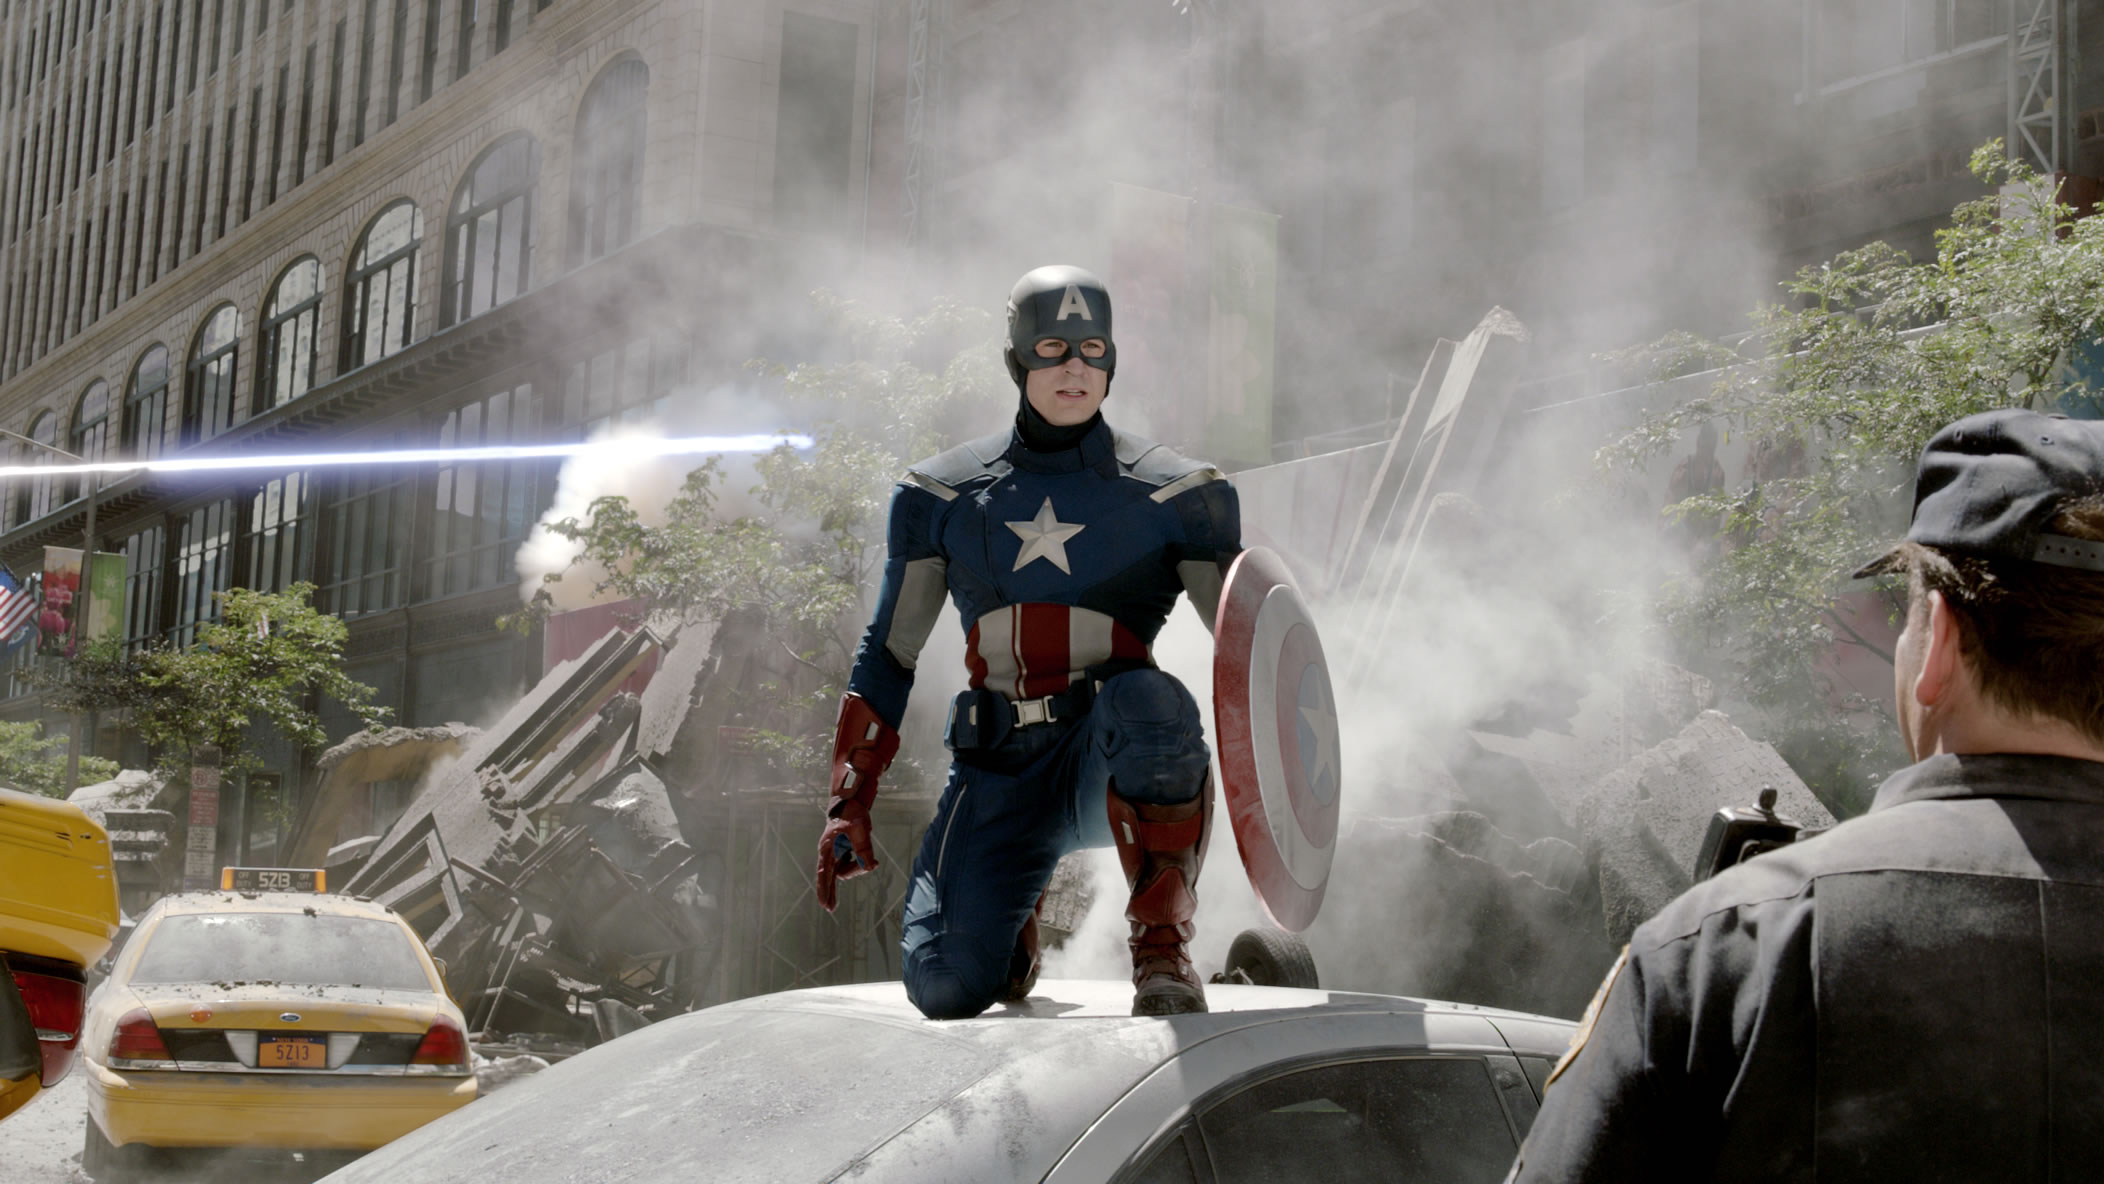 avengers-movie-image-chris-evans